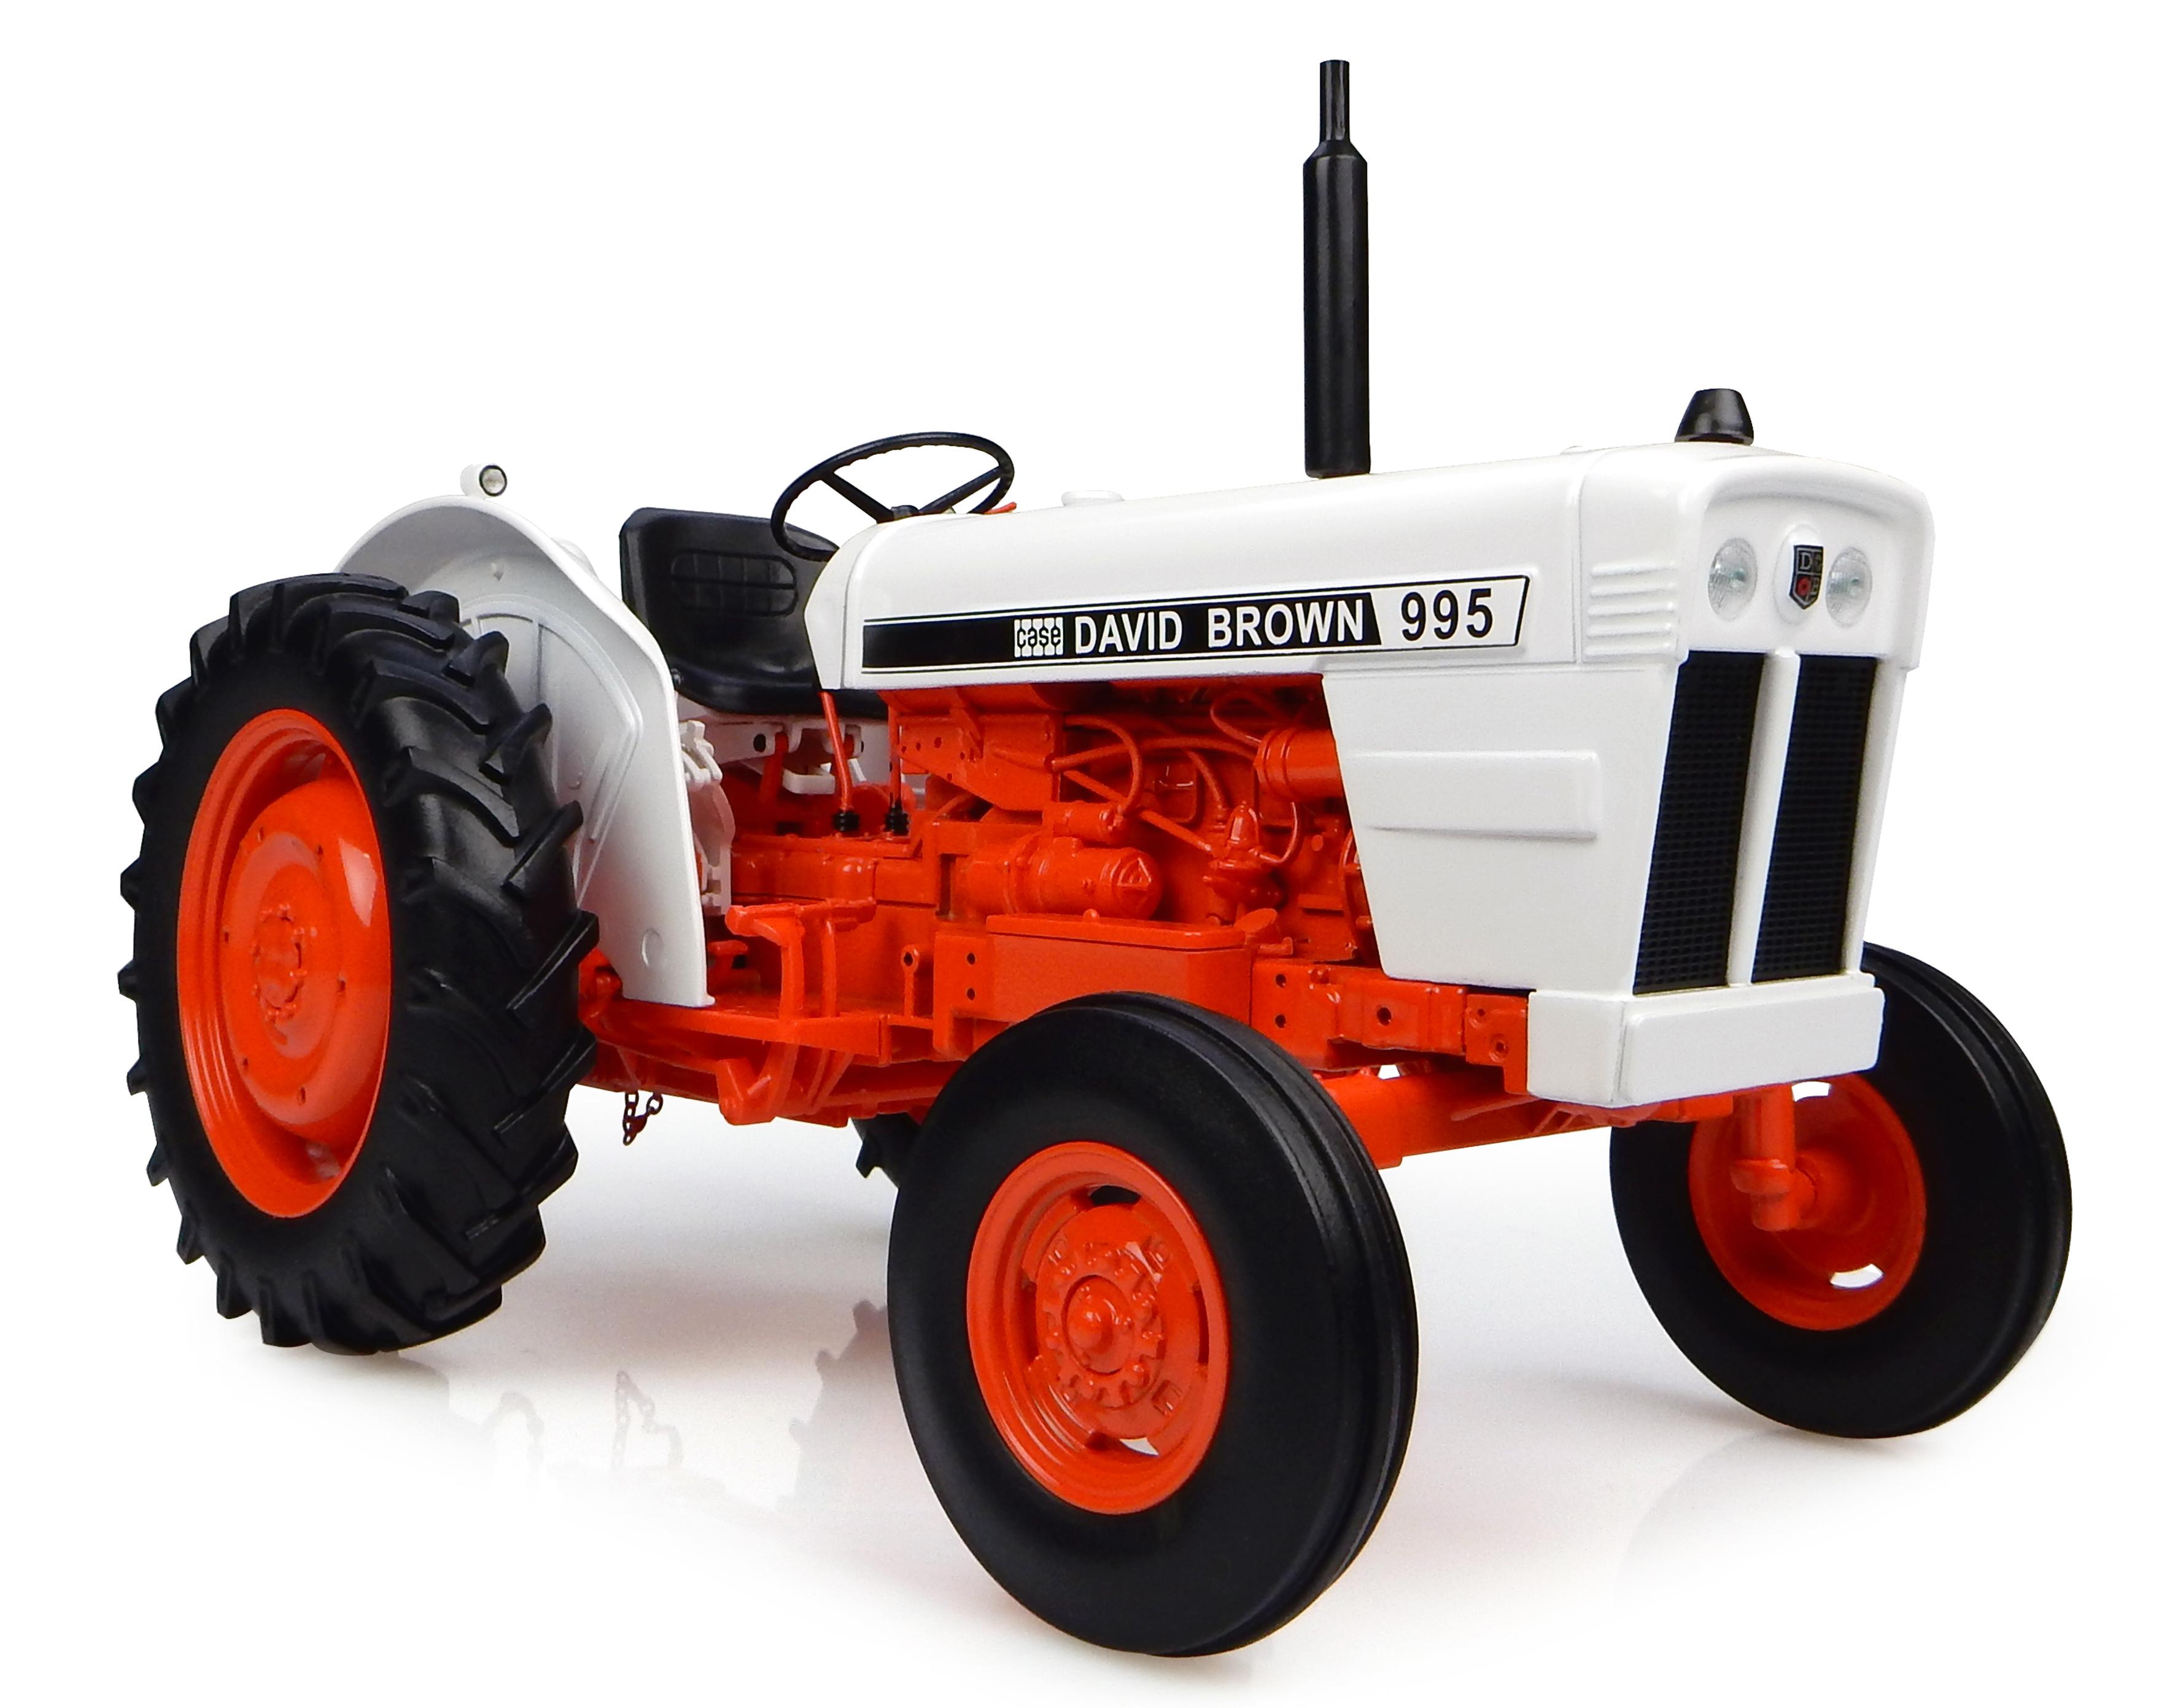 1973 Case David Brown 995 Tractor 1/16 Diecast Model by Universal Hobbies